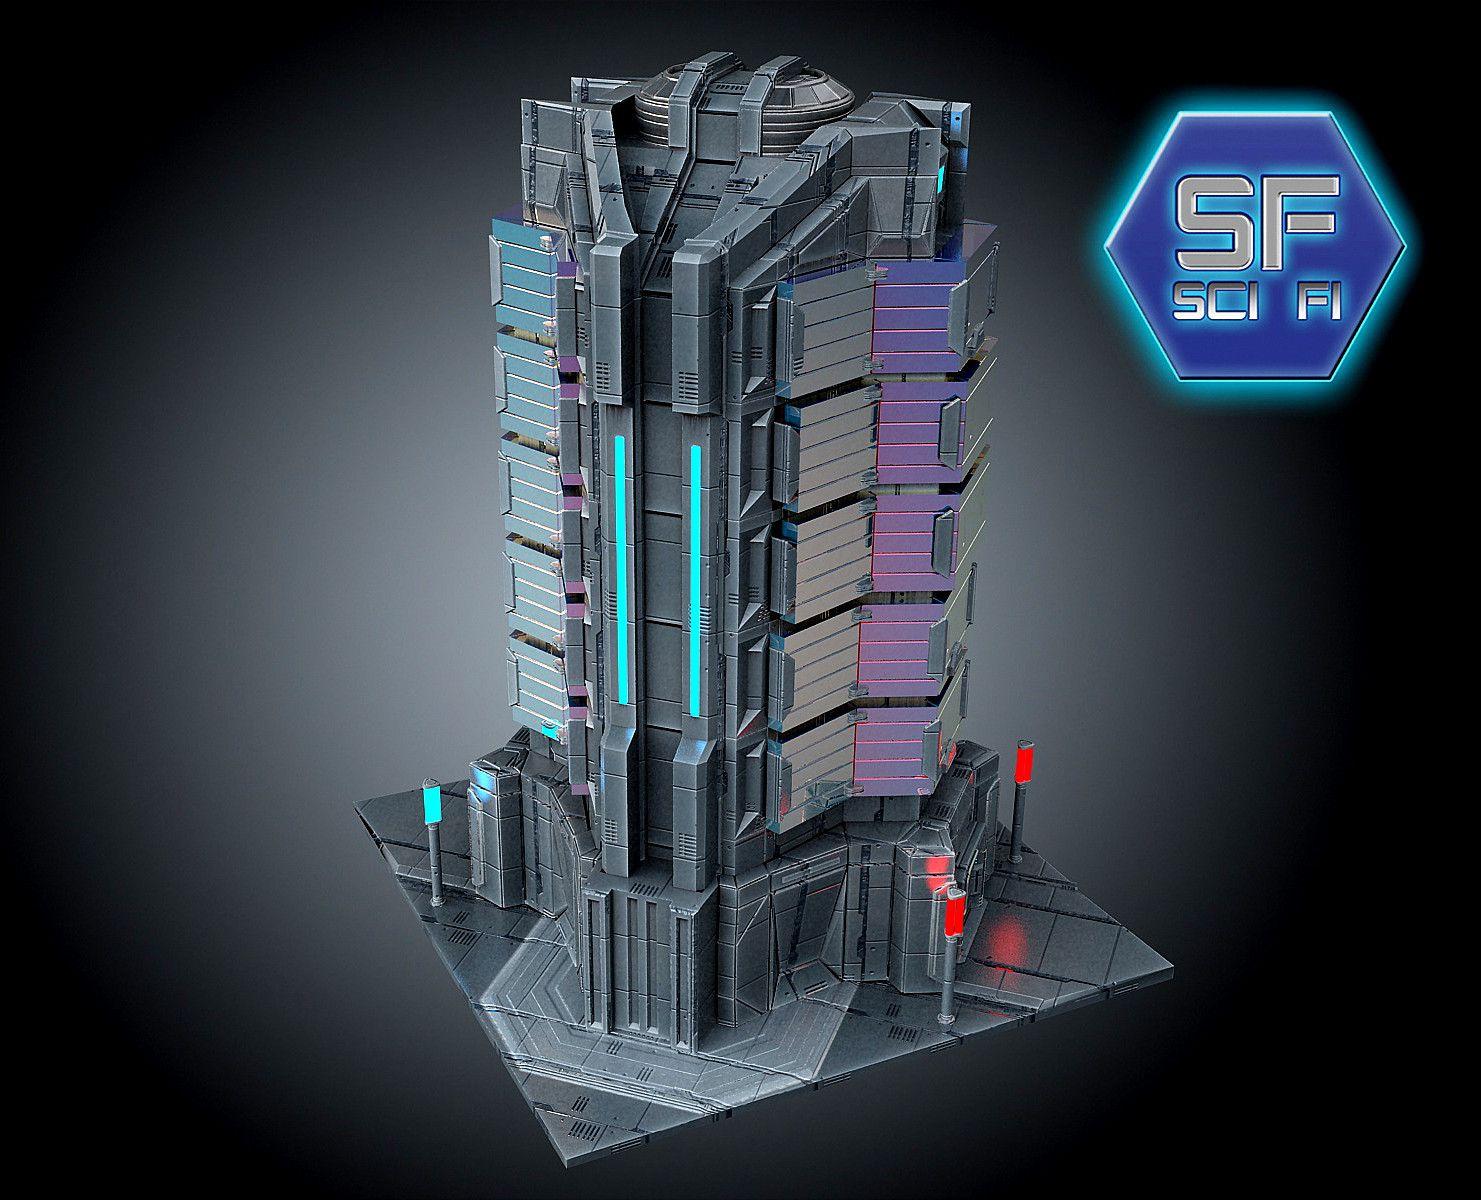 3d sci fi futuristic building Futuristic architecture